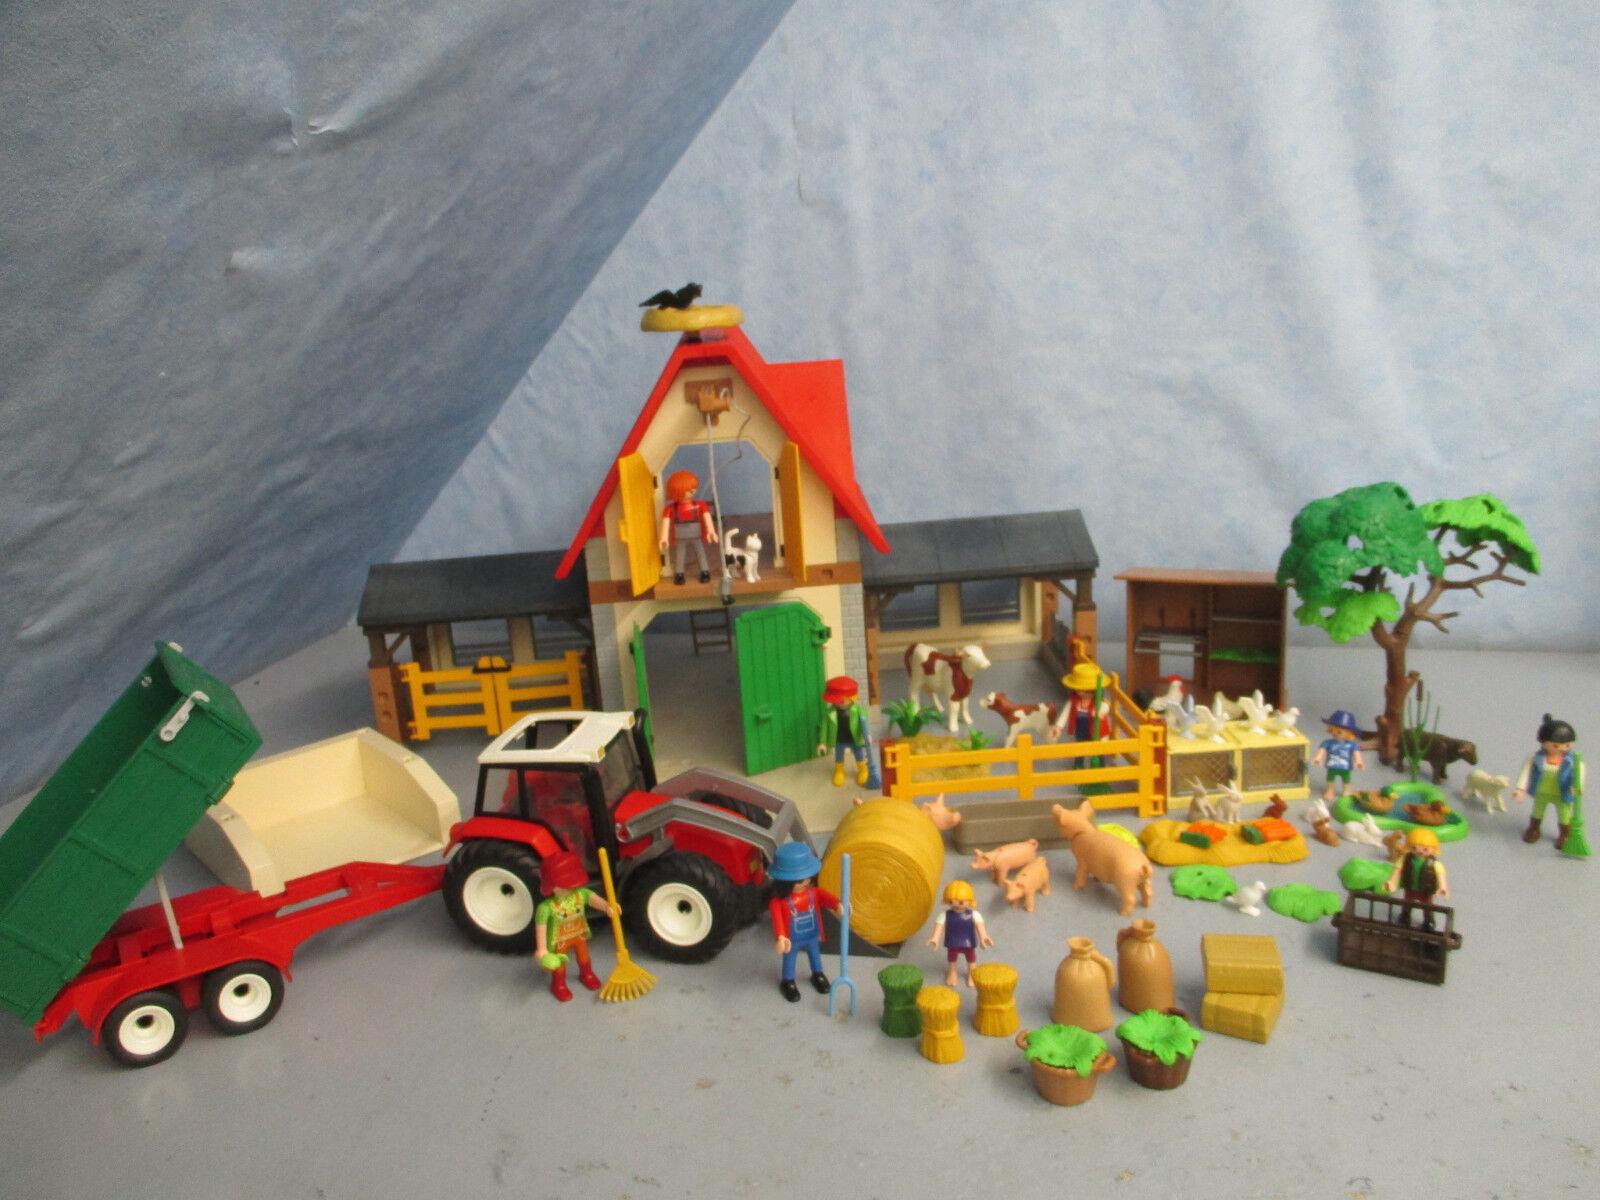 4490 Hasenstall Bauernhof 4496 Traktor Hasenstall 4490 Hühnerstall  Playmobil 4692 dedd6e